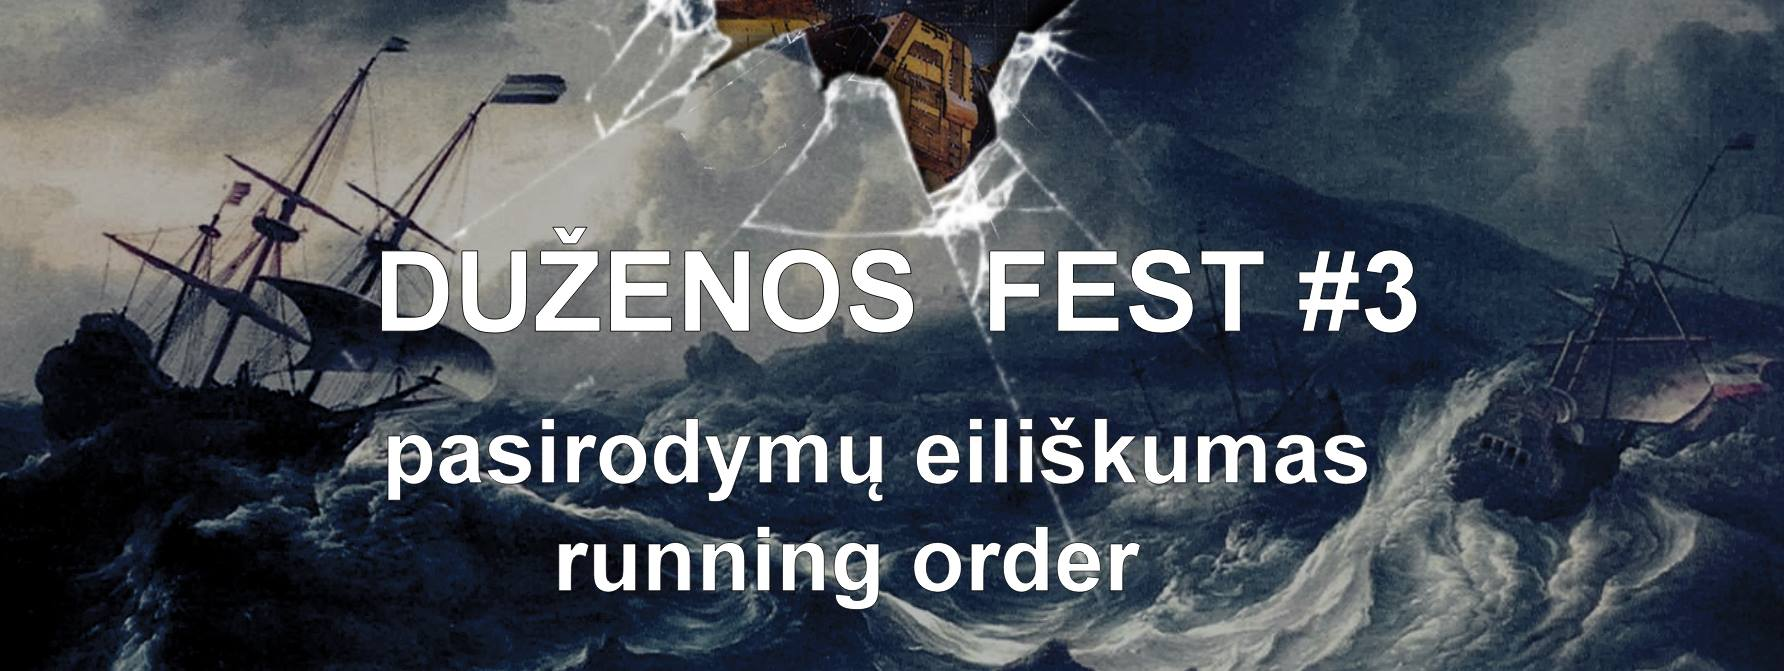 duzenos fest 3 running order